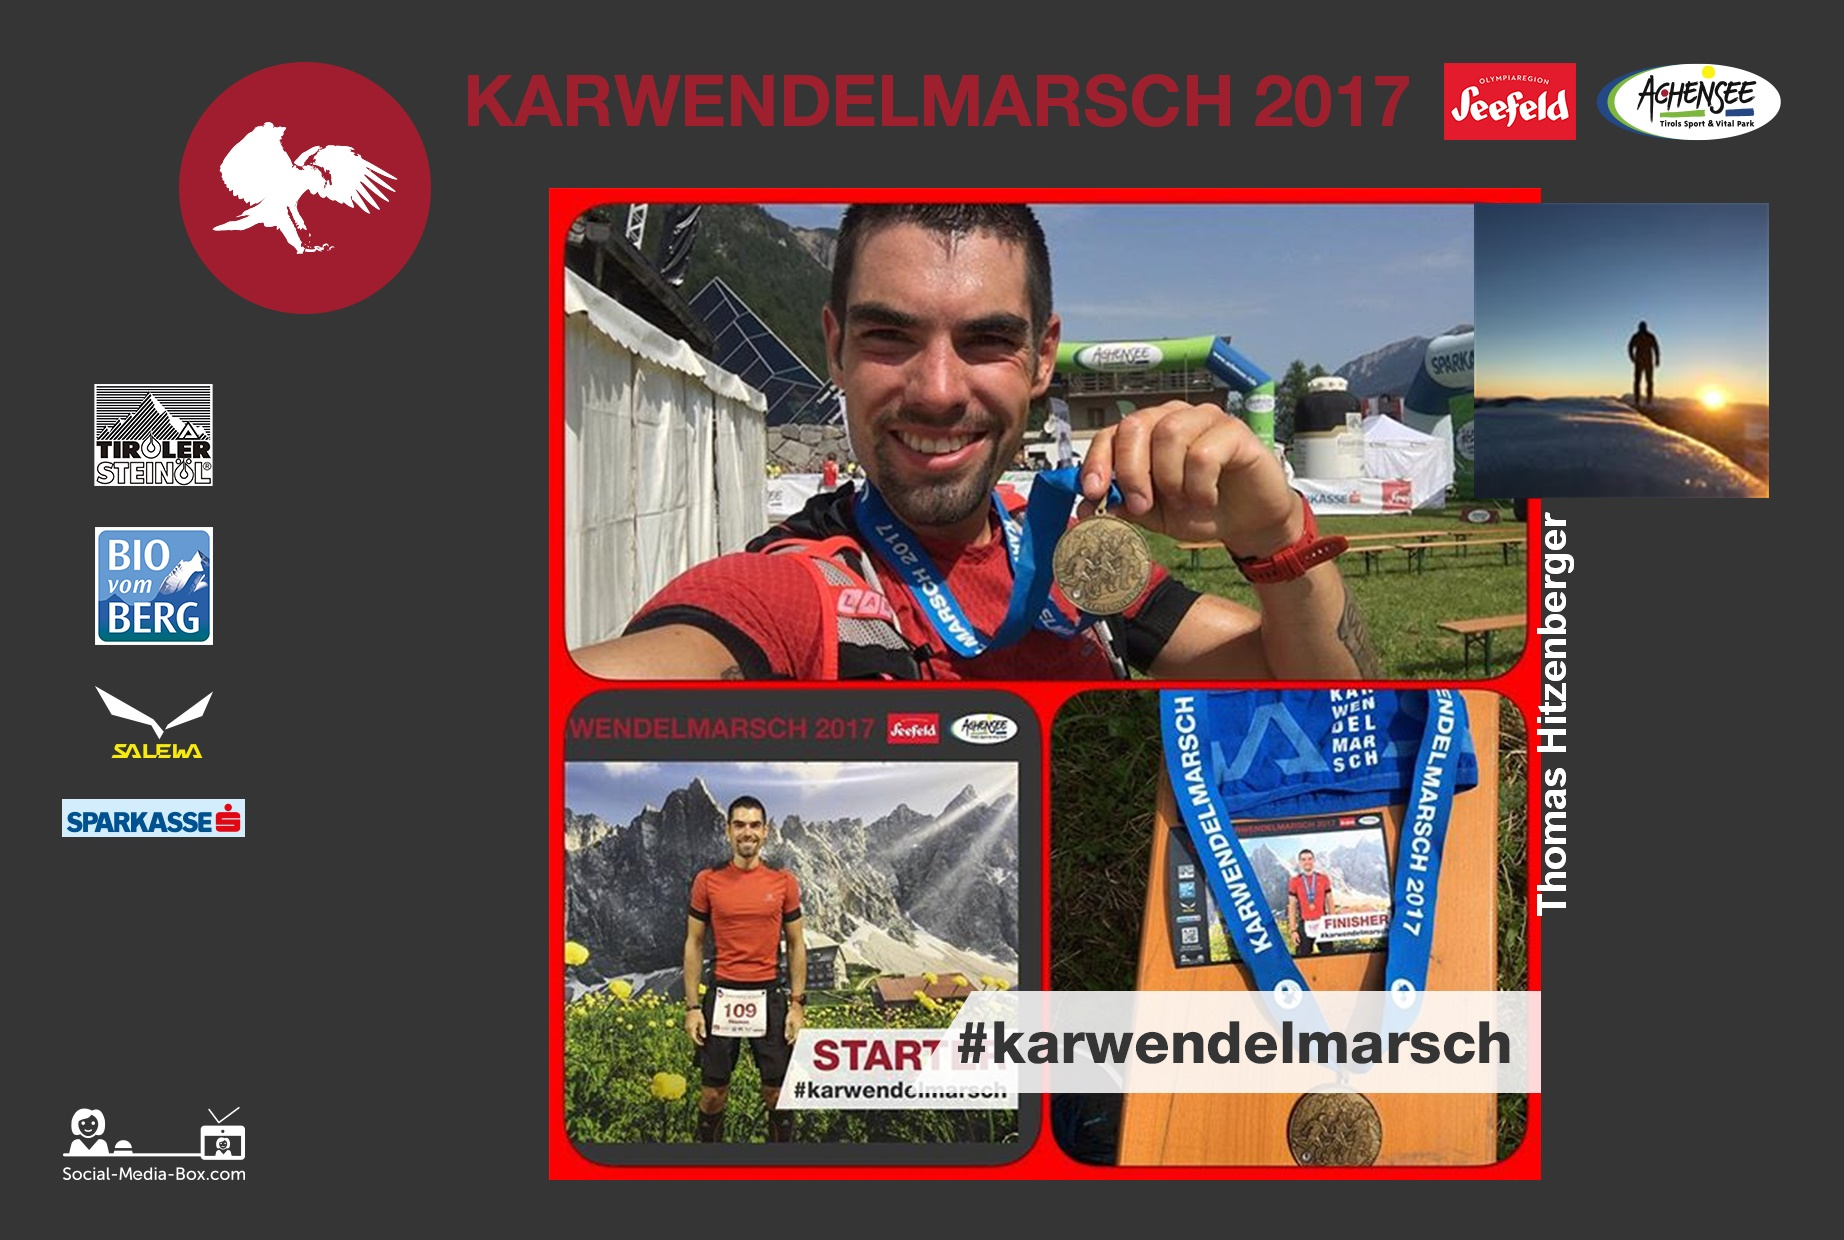 HashtagPrinter_Karwendelmarsch2017_Social-Media-Box_Print2